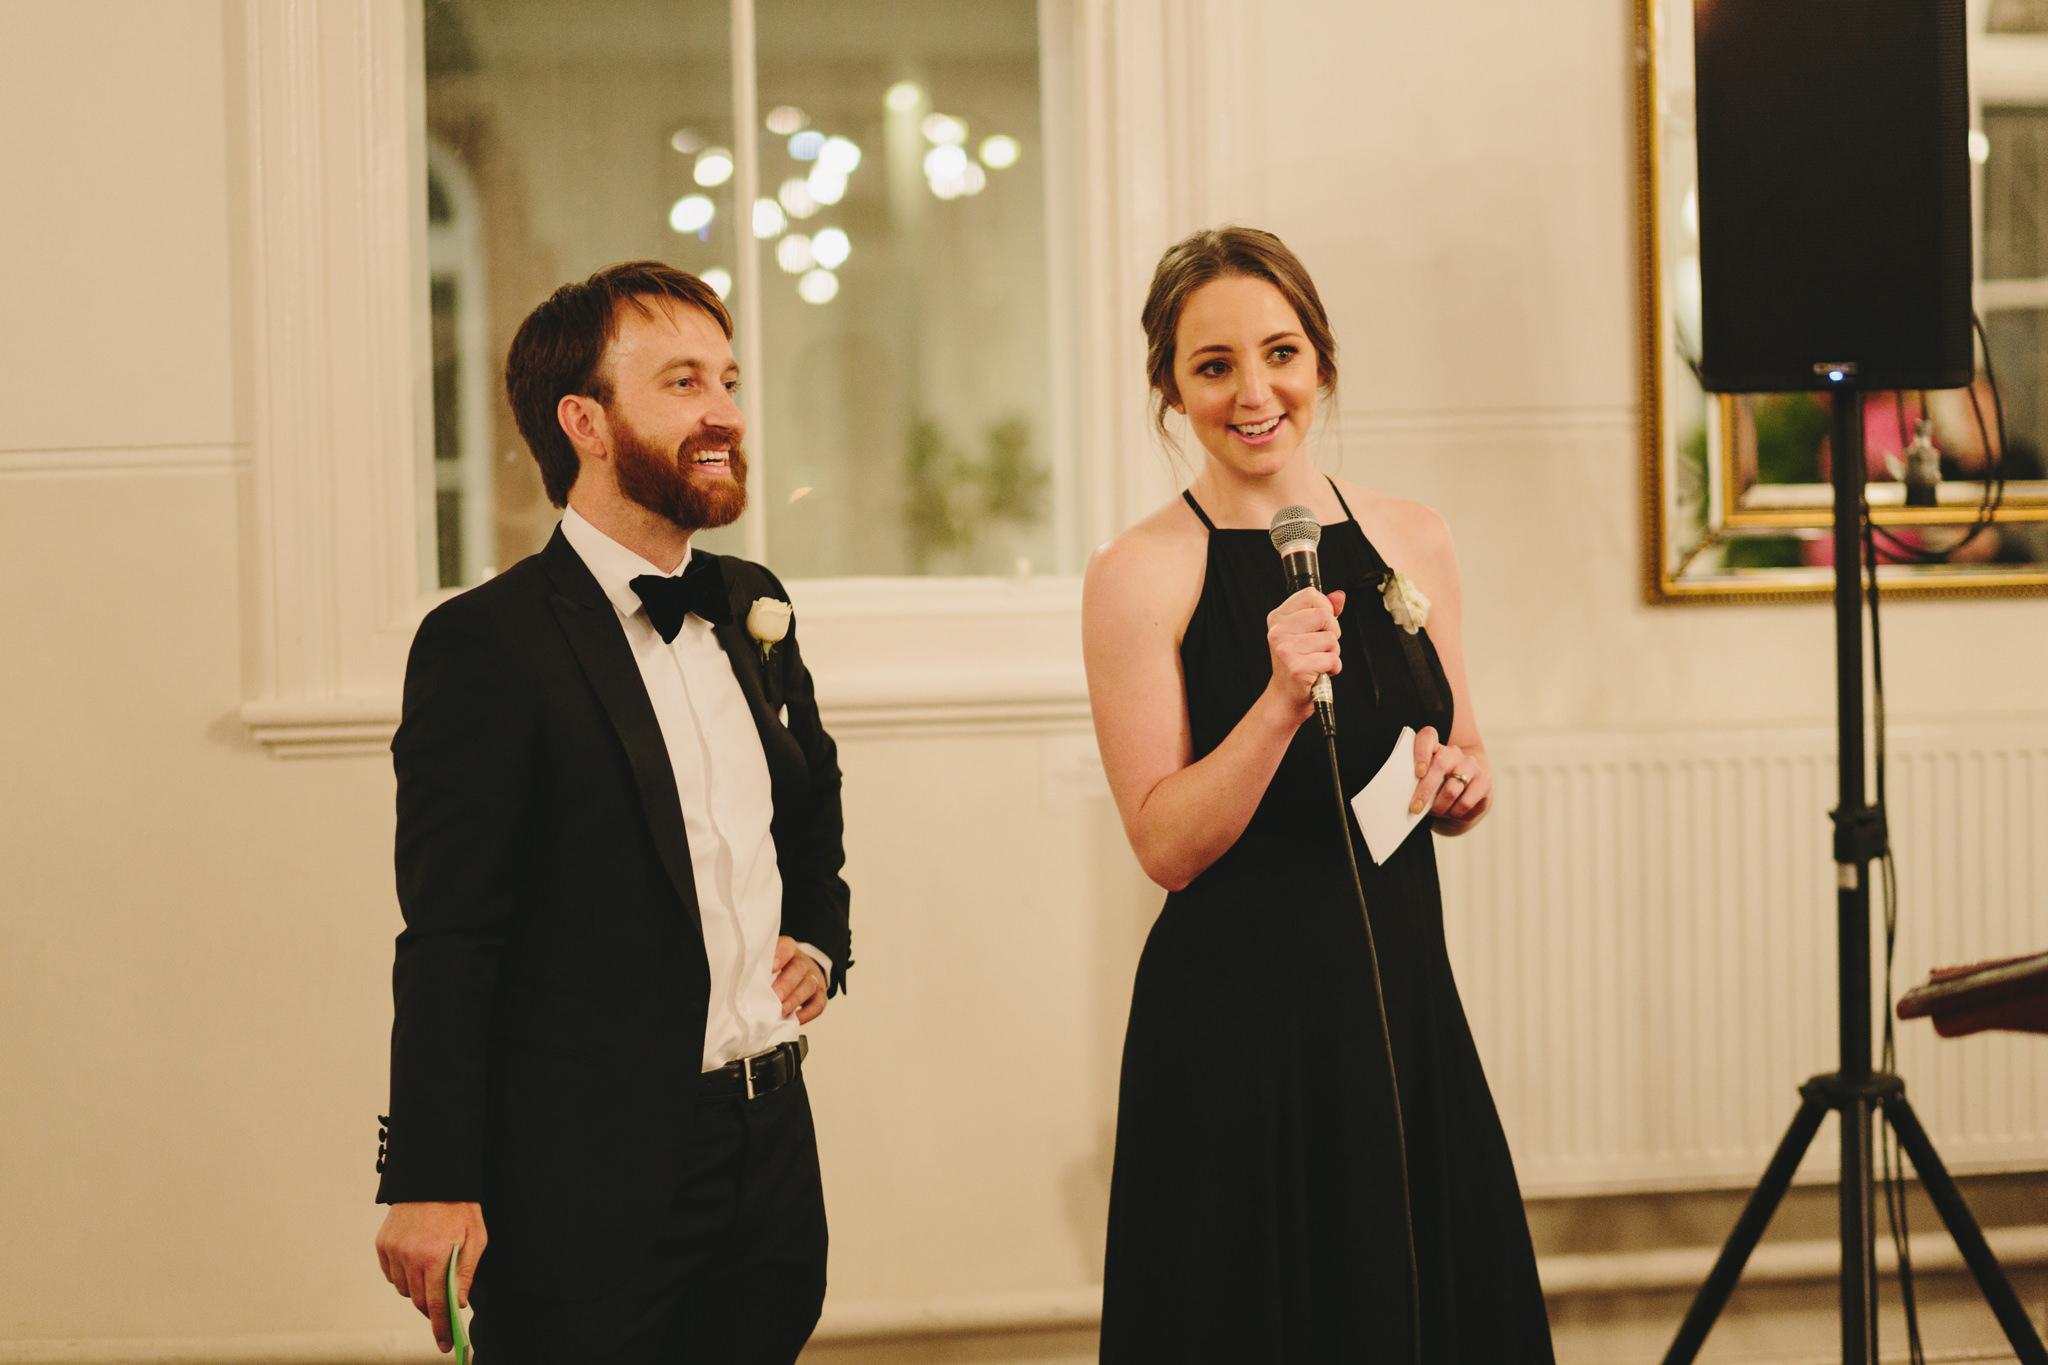 Abbotsford_Convent_Wedding_Peter_Anna119.JPG